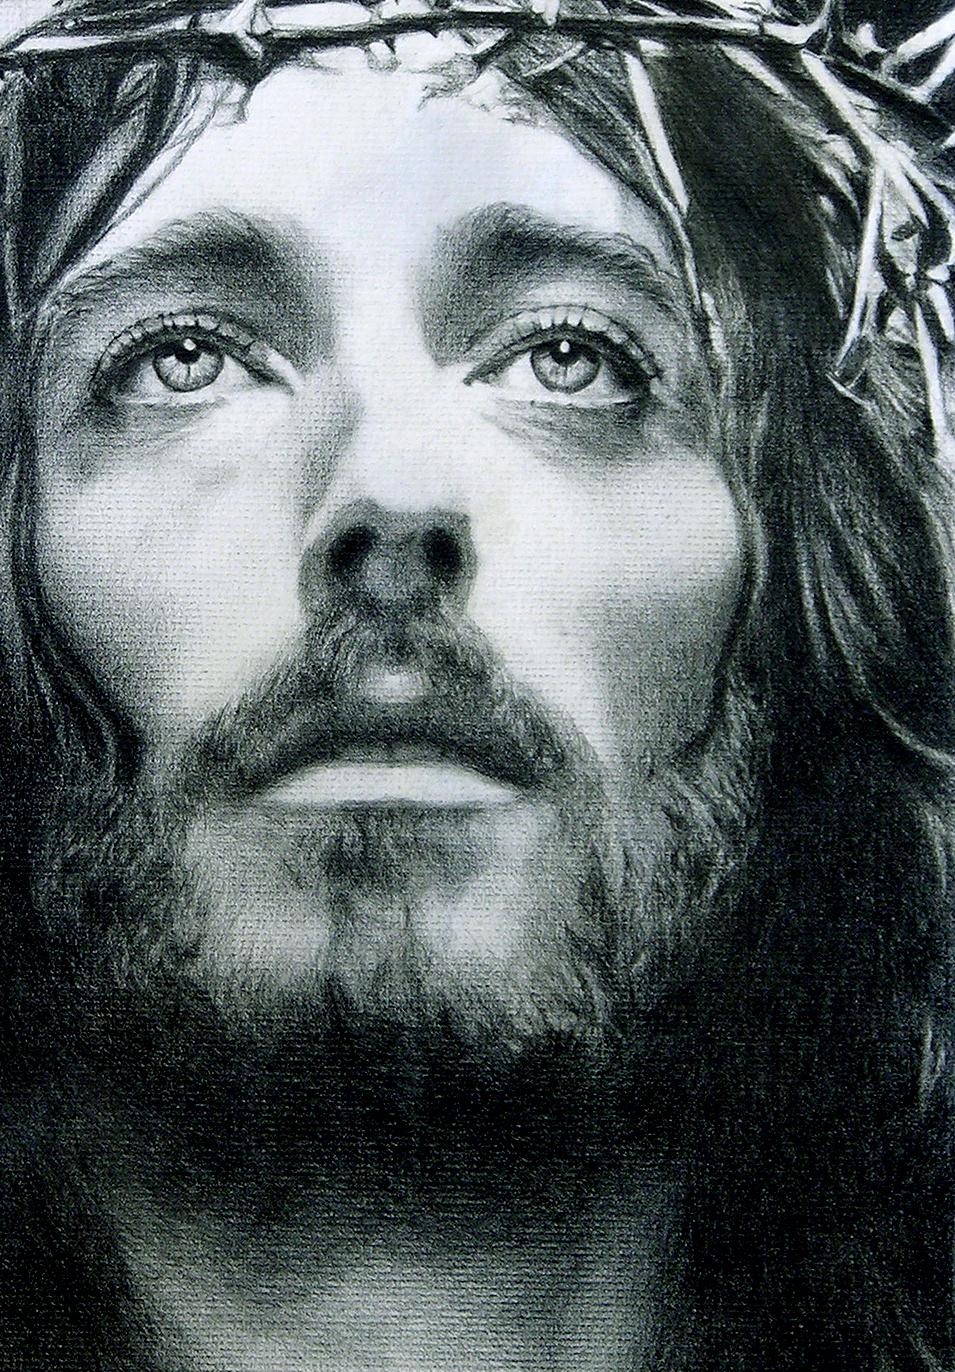 Image De Noel Jesus.Atonement Jesus Christ Portrait By Noel Cruz By Noeling On